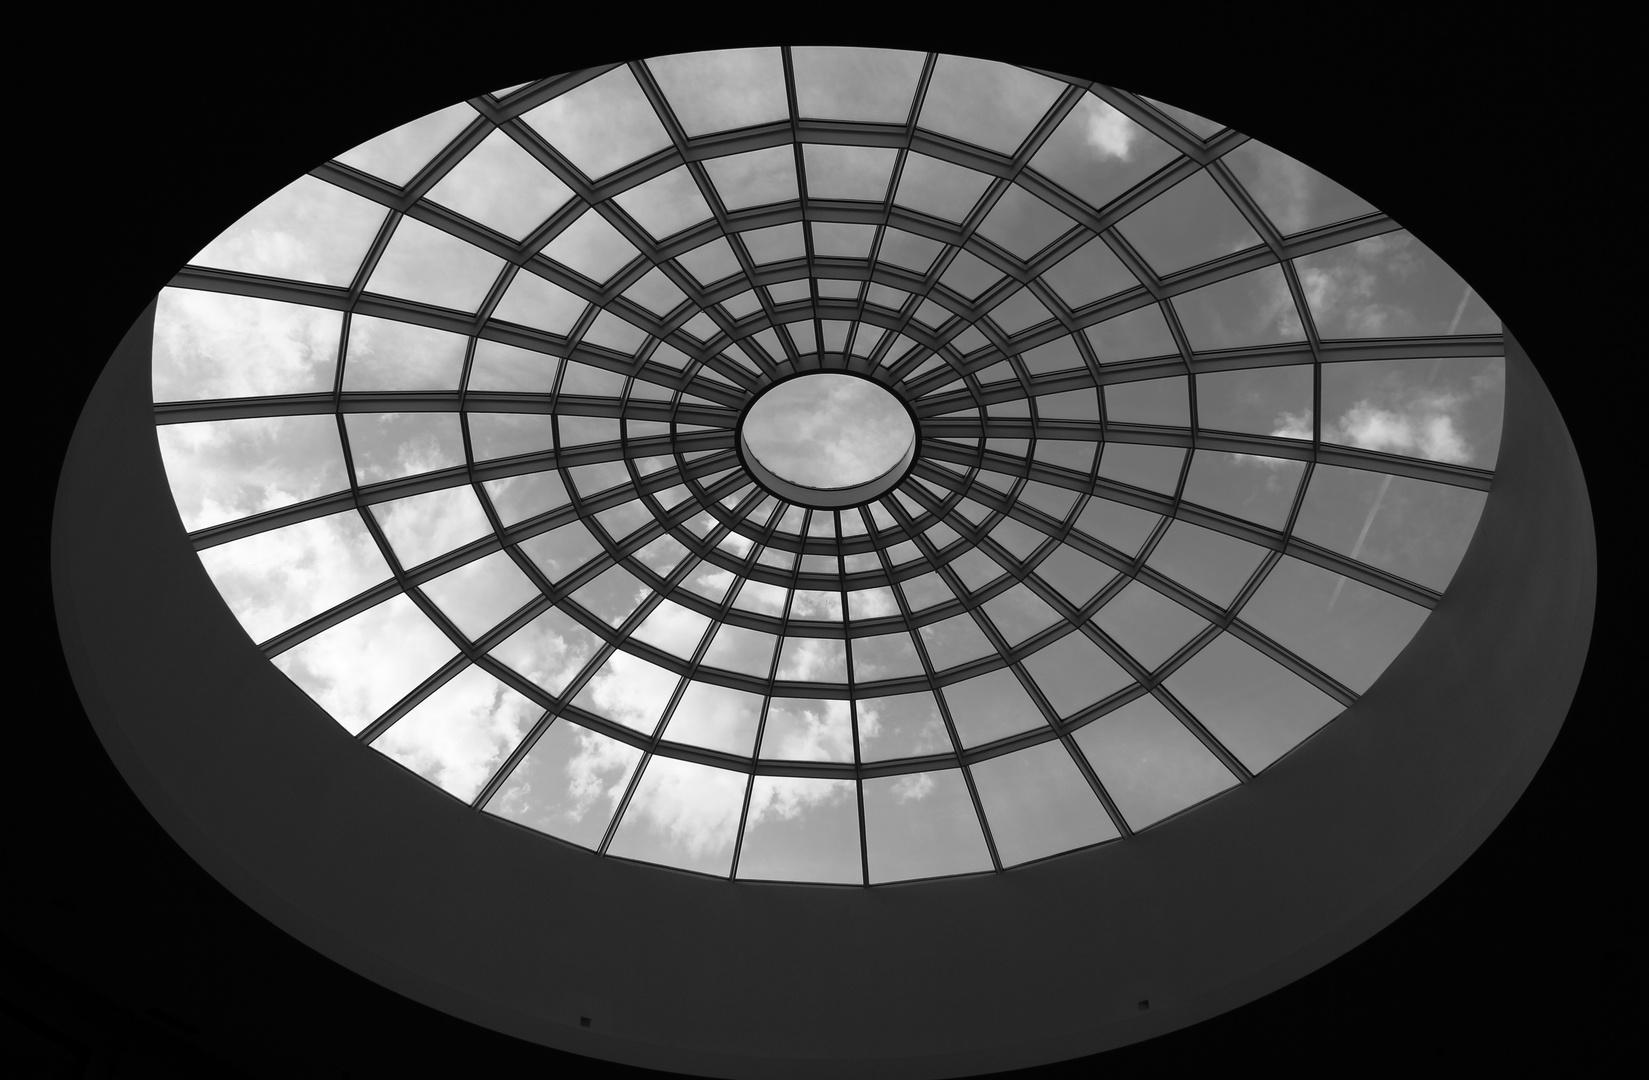 Dachkuppel